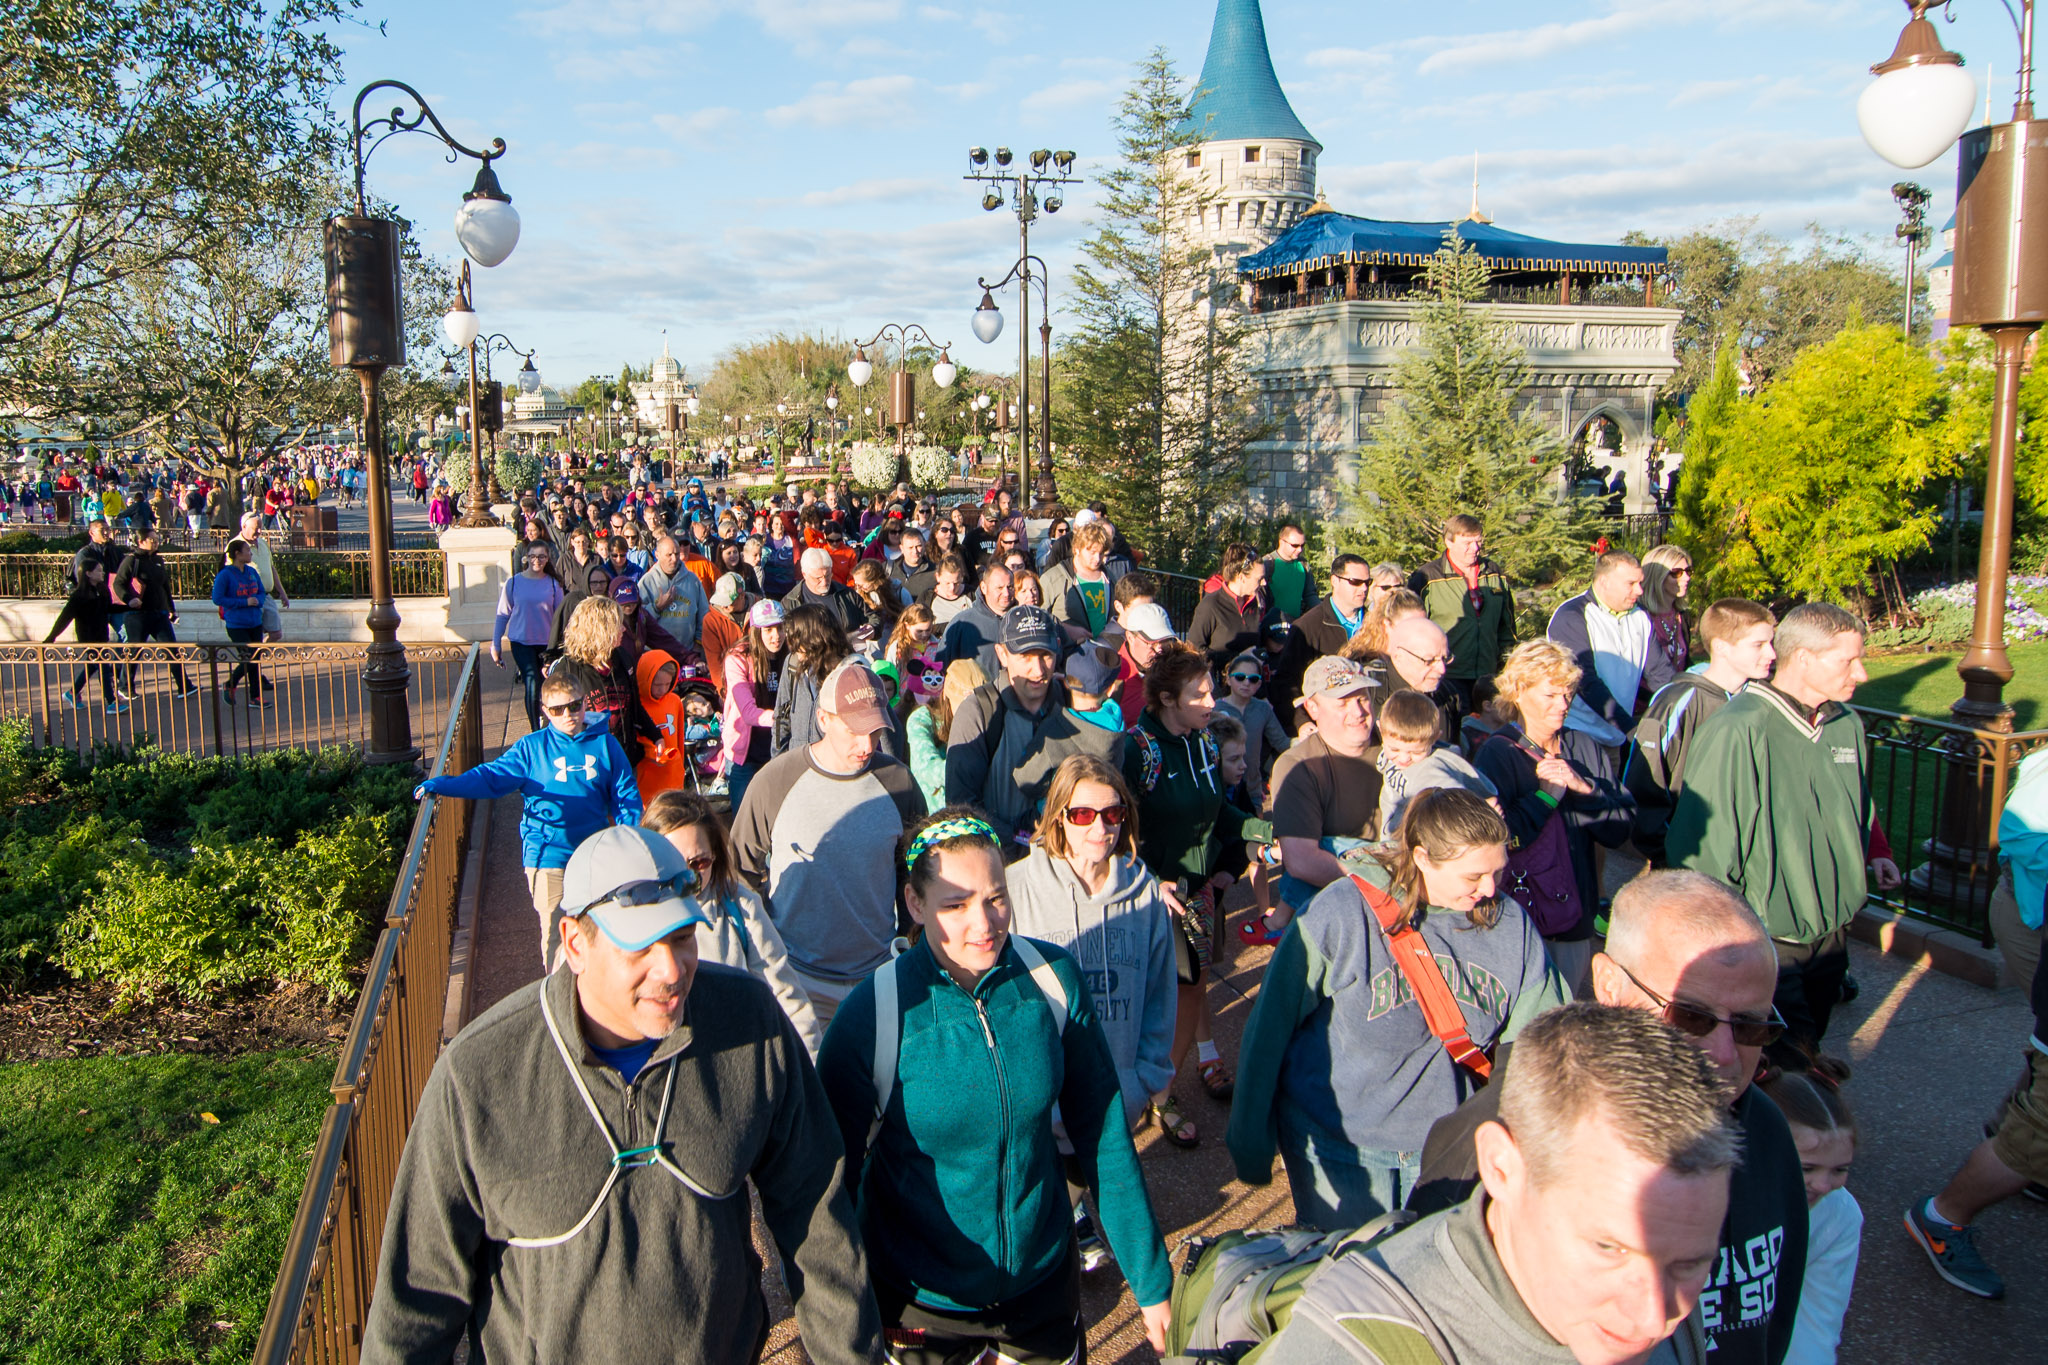 Crowds to Seven Dwarfs Mine Train - Walt Disney World Magic Kingdom